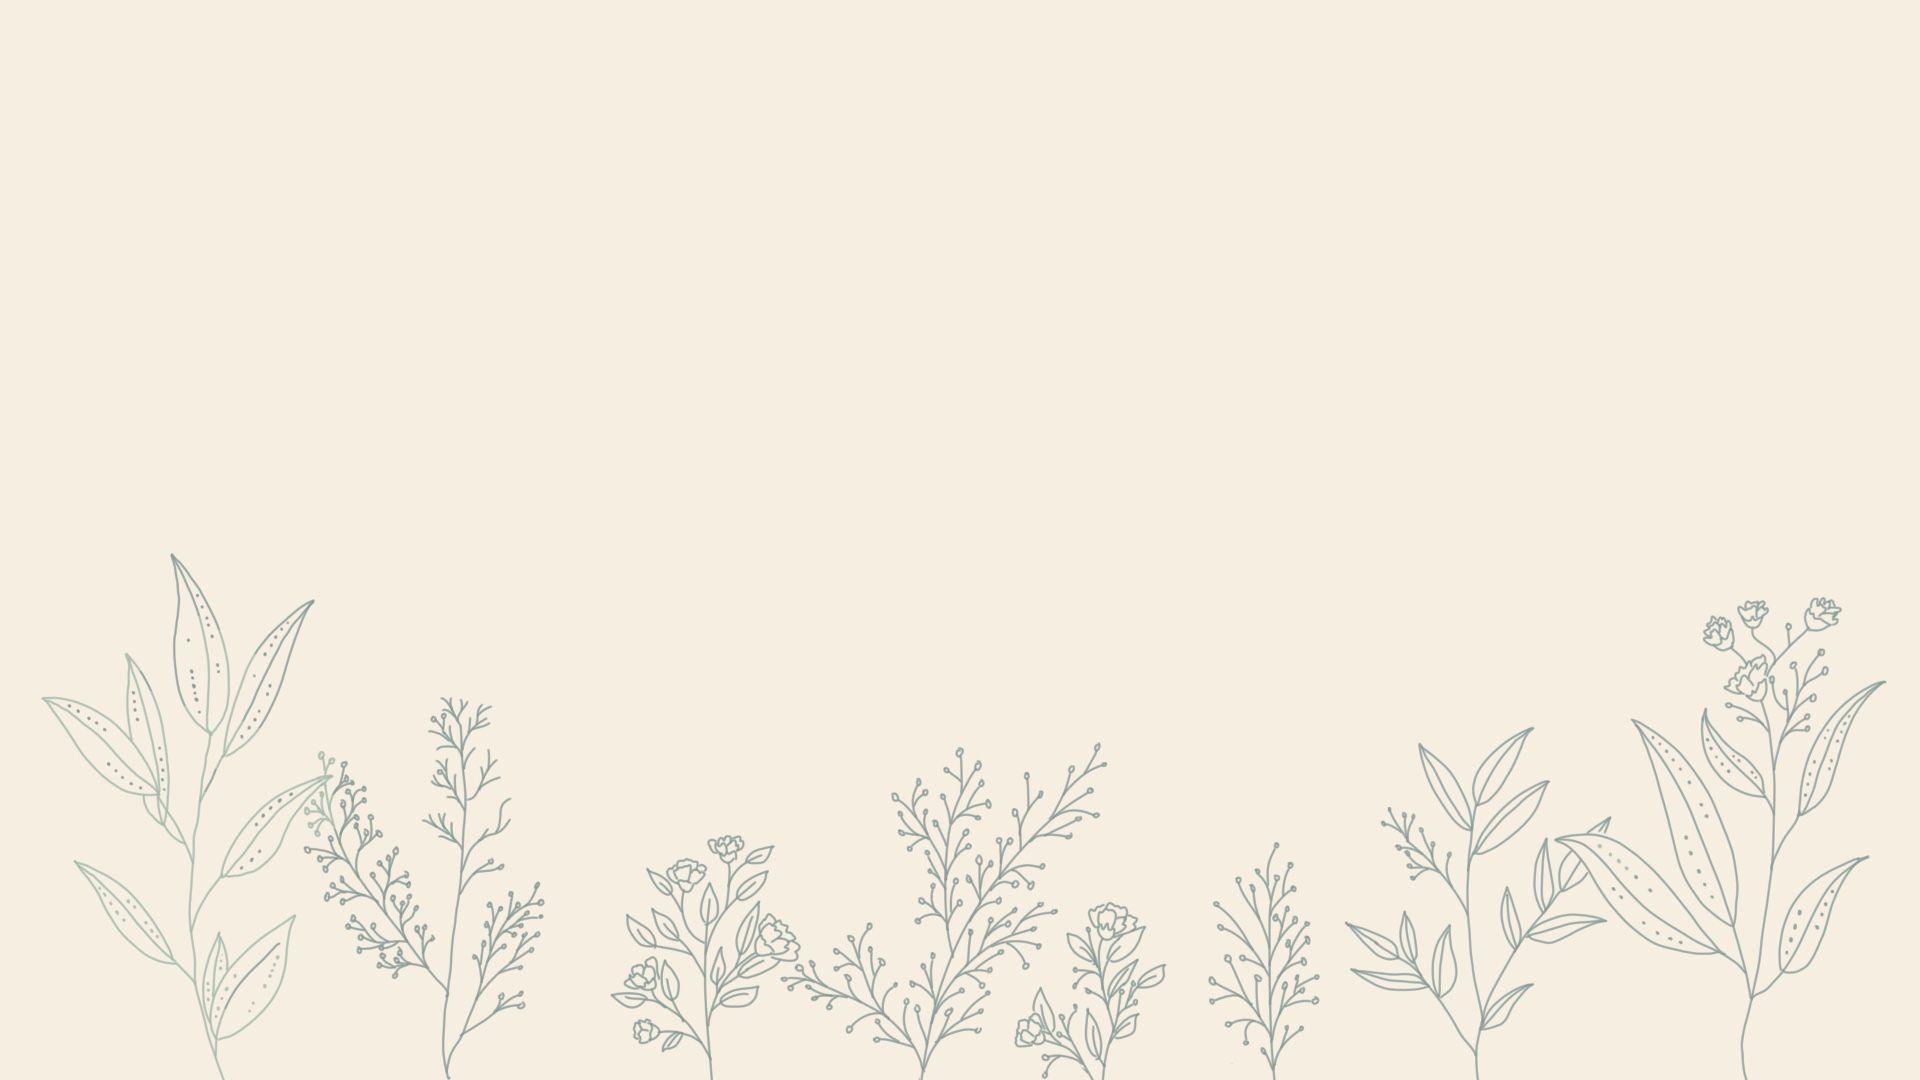 Aesthetic Minimalist Plant Desktop Wallpapers Wallpaper Cave Superman minimalism dc comics wallpaper, hd minimalist 4k wallpapers, images, photos and background. aesthetic minimalist plant desktop